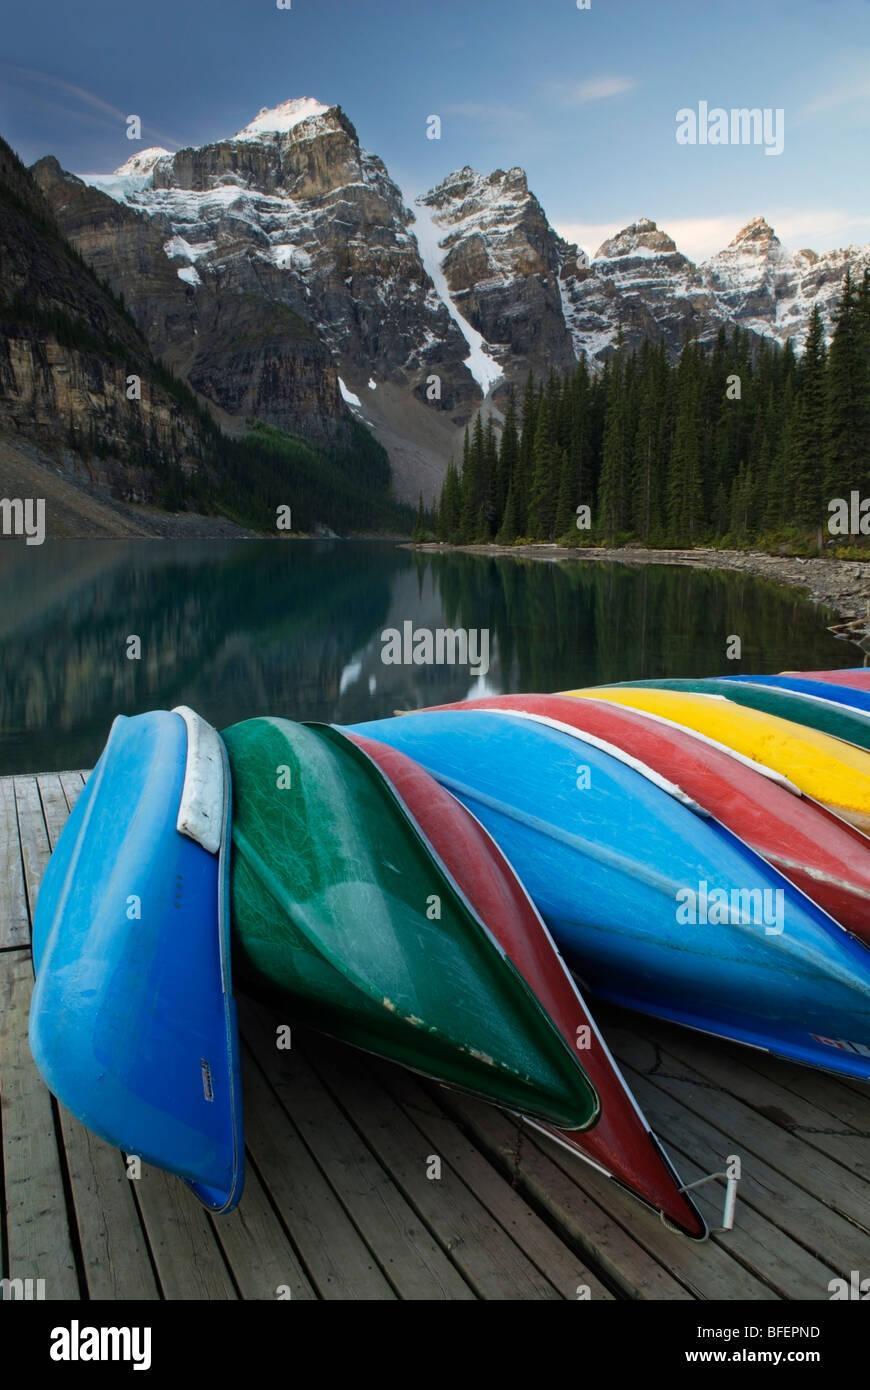 Canoes, Valley of the Ten Peaks, Wenkchemna Range, Moraine Lake, Banff National Park, Alberta, Canada - Stock Image